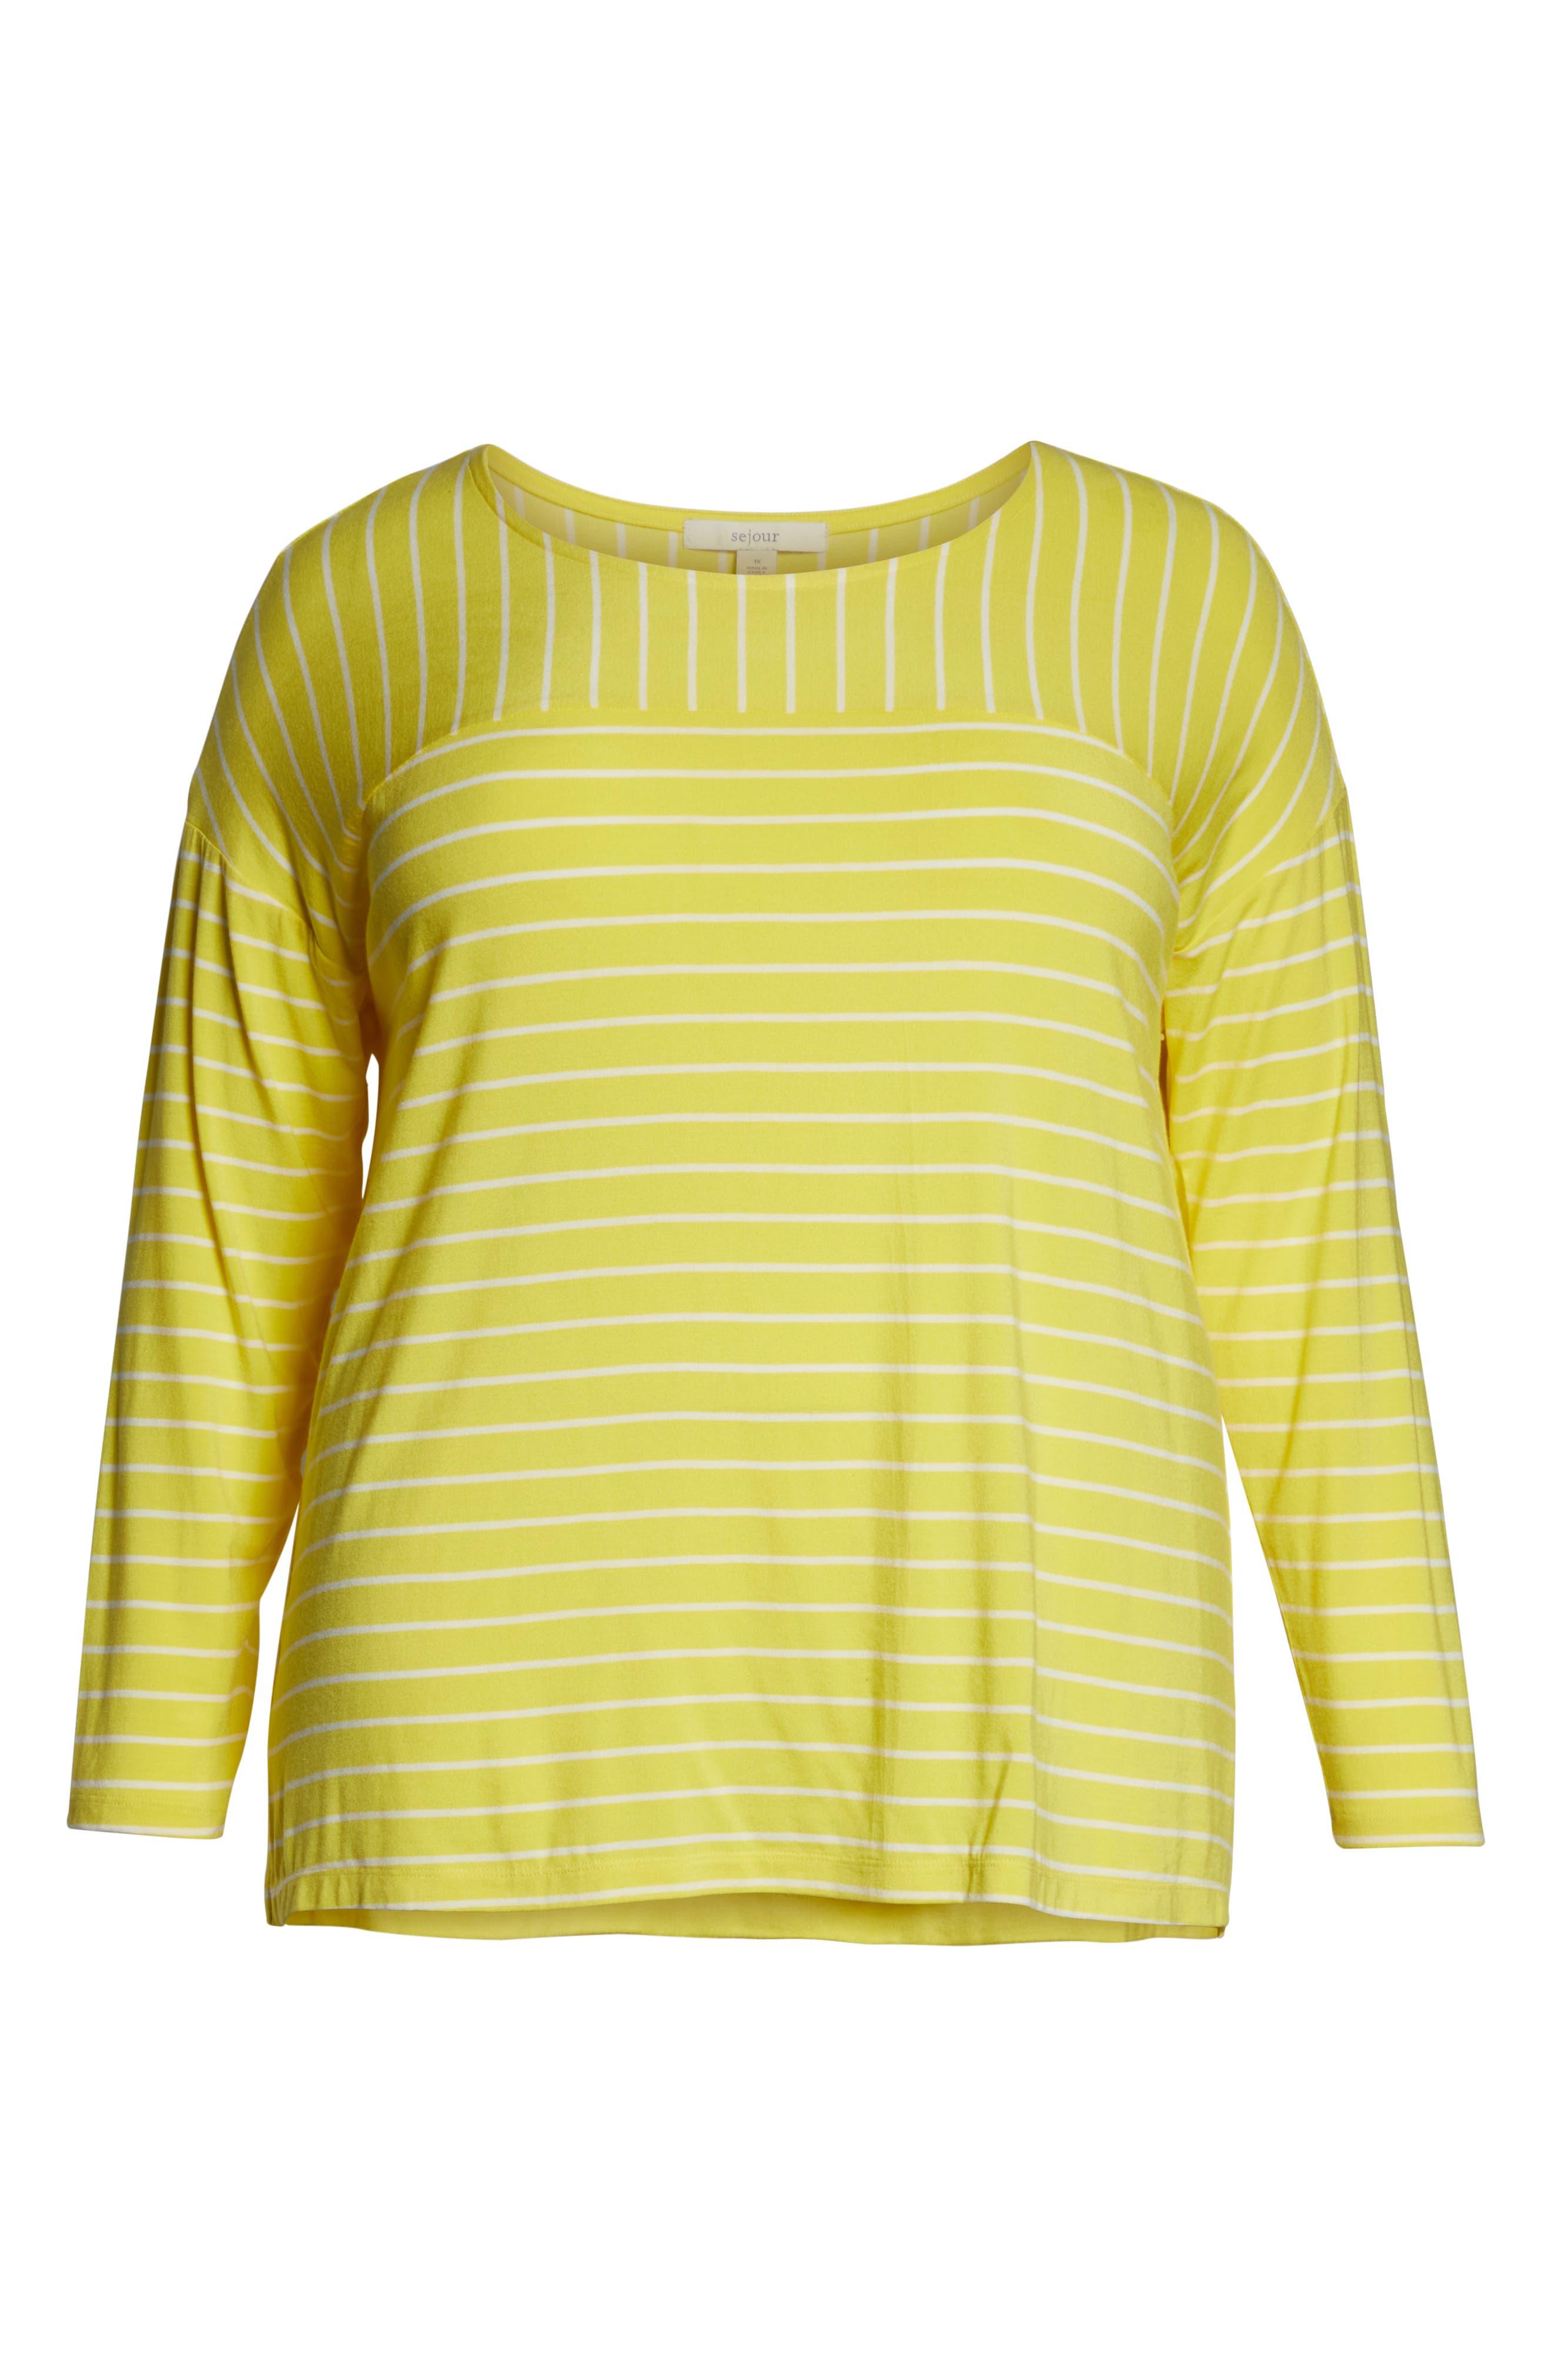 SEJOUR, Stripe Long Sleeve Tee, Alternate thumbnail 6, color, YELLOW ANYA STRIPE